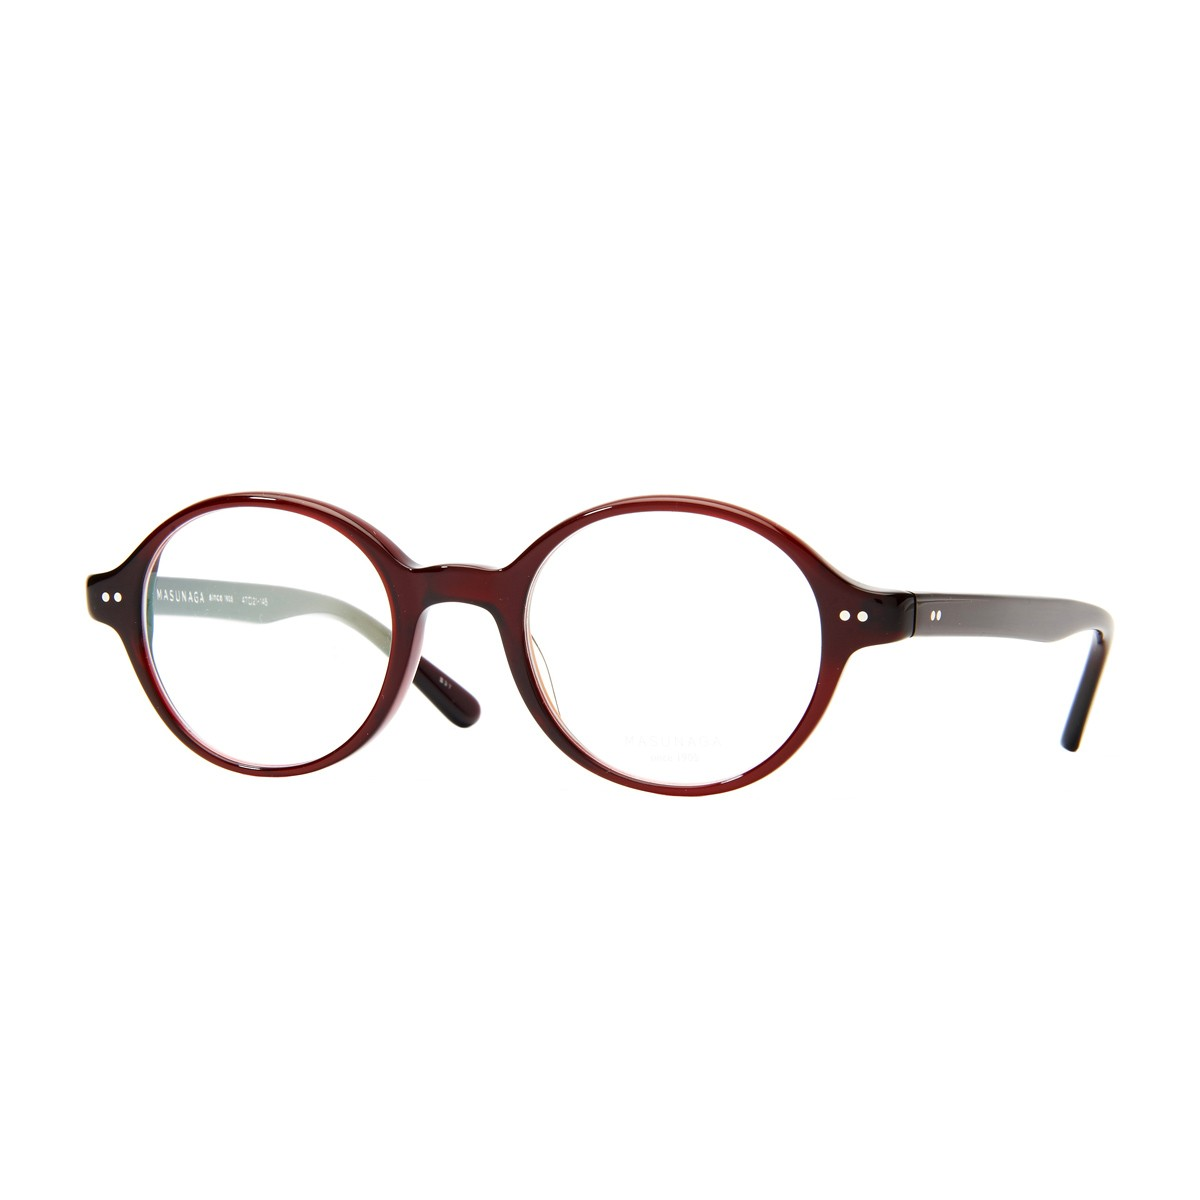 Masunaga 023 | Men's eyeglasses